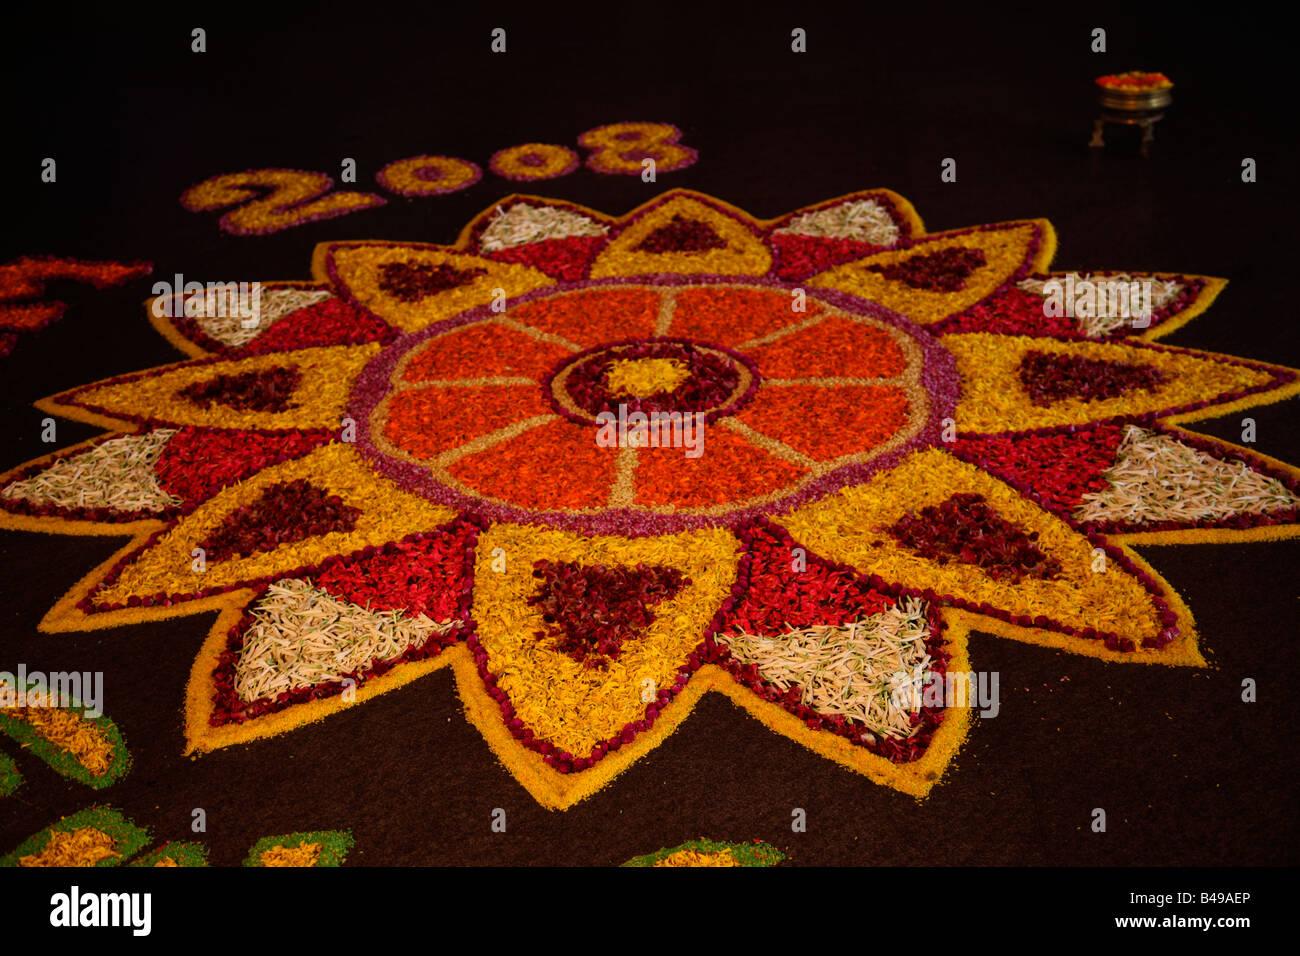 Floral design- made up of flower petals - Stock Image